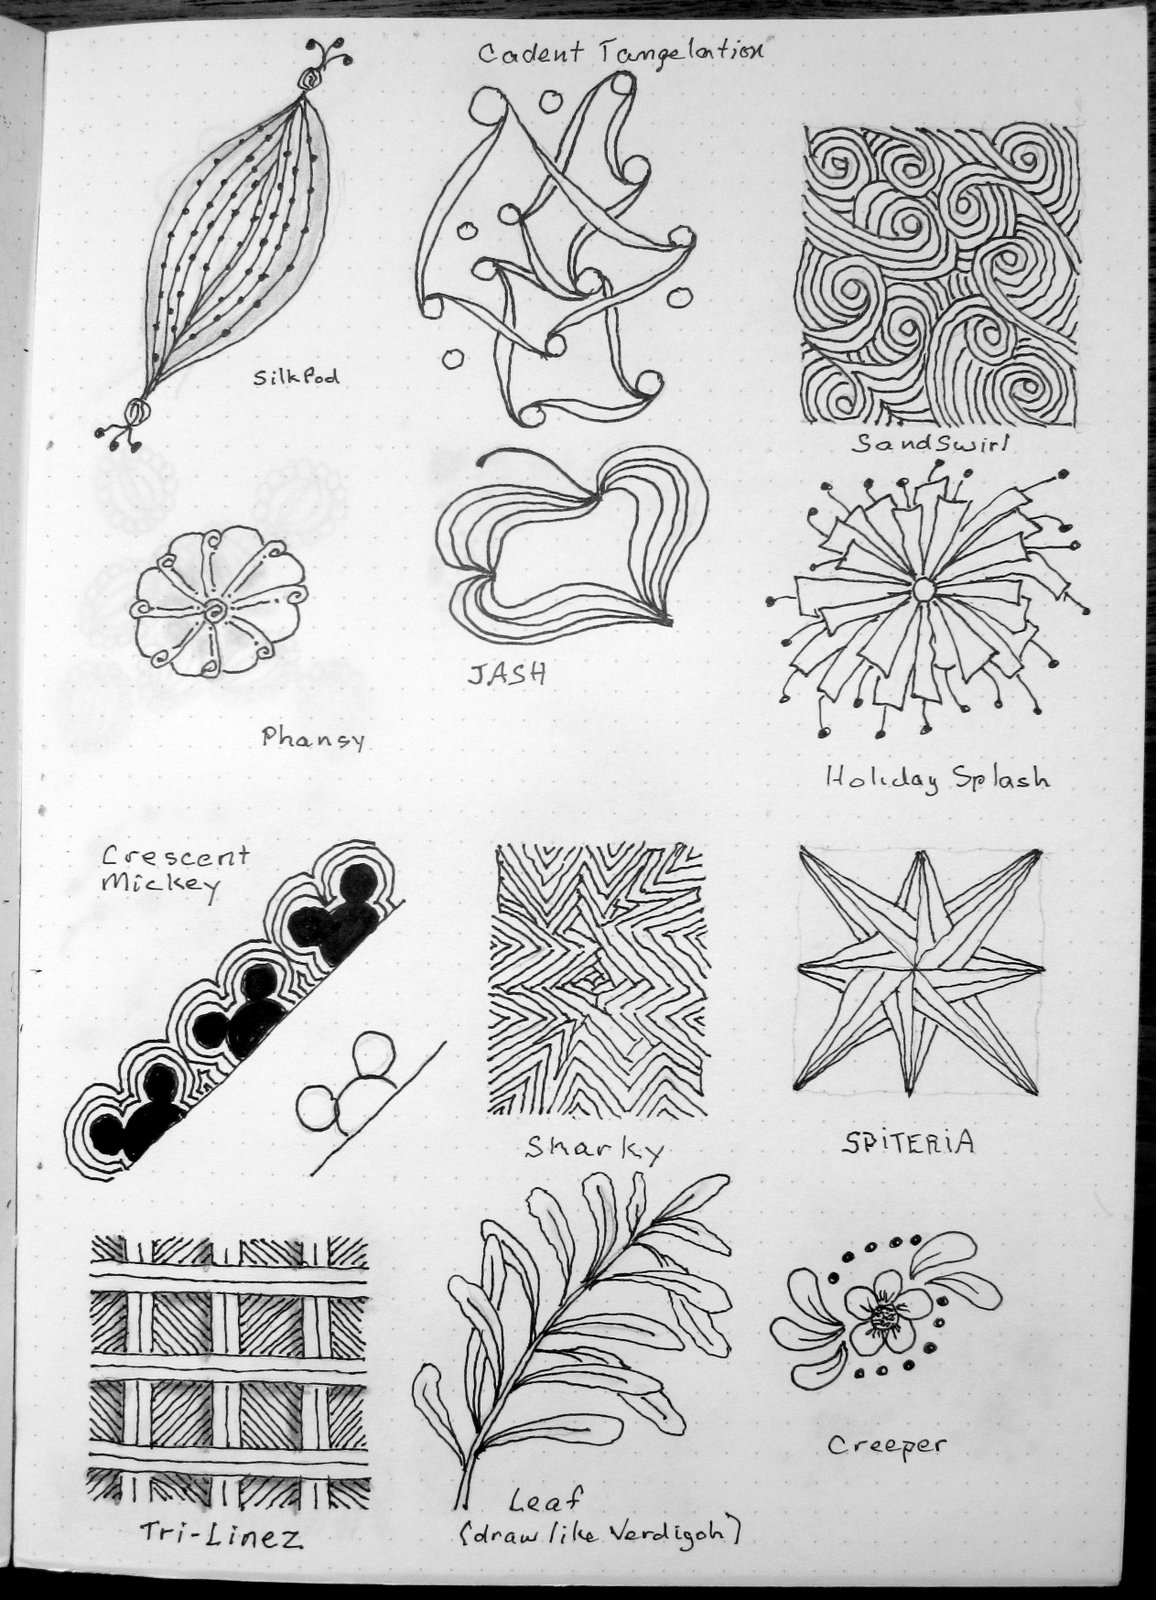 Tangle Patterns Magnificent Design Ideas